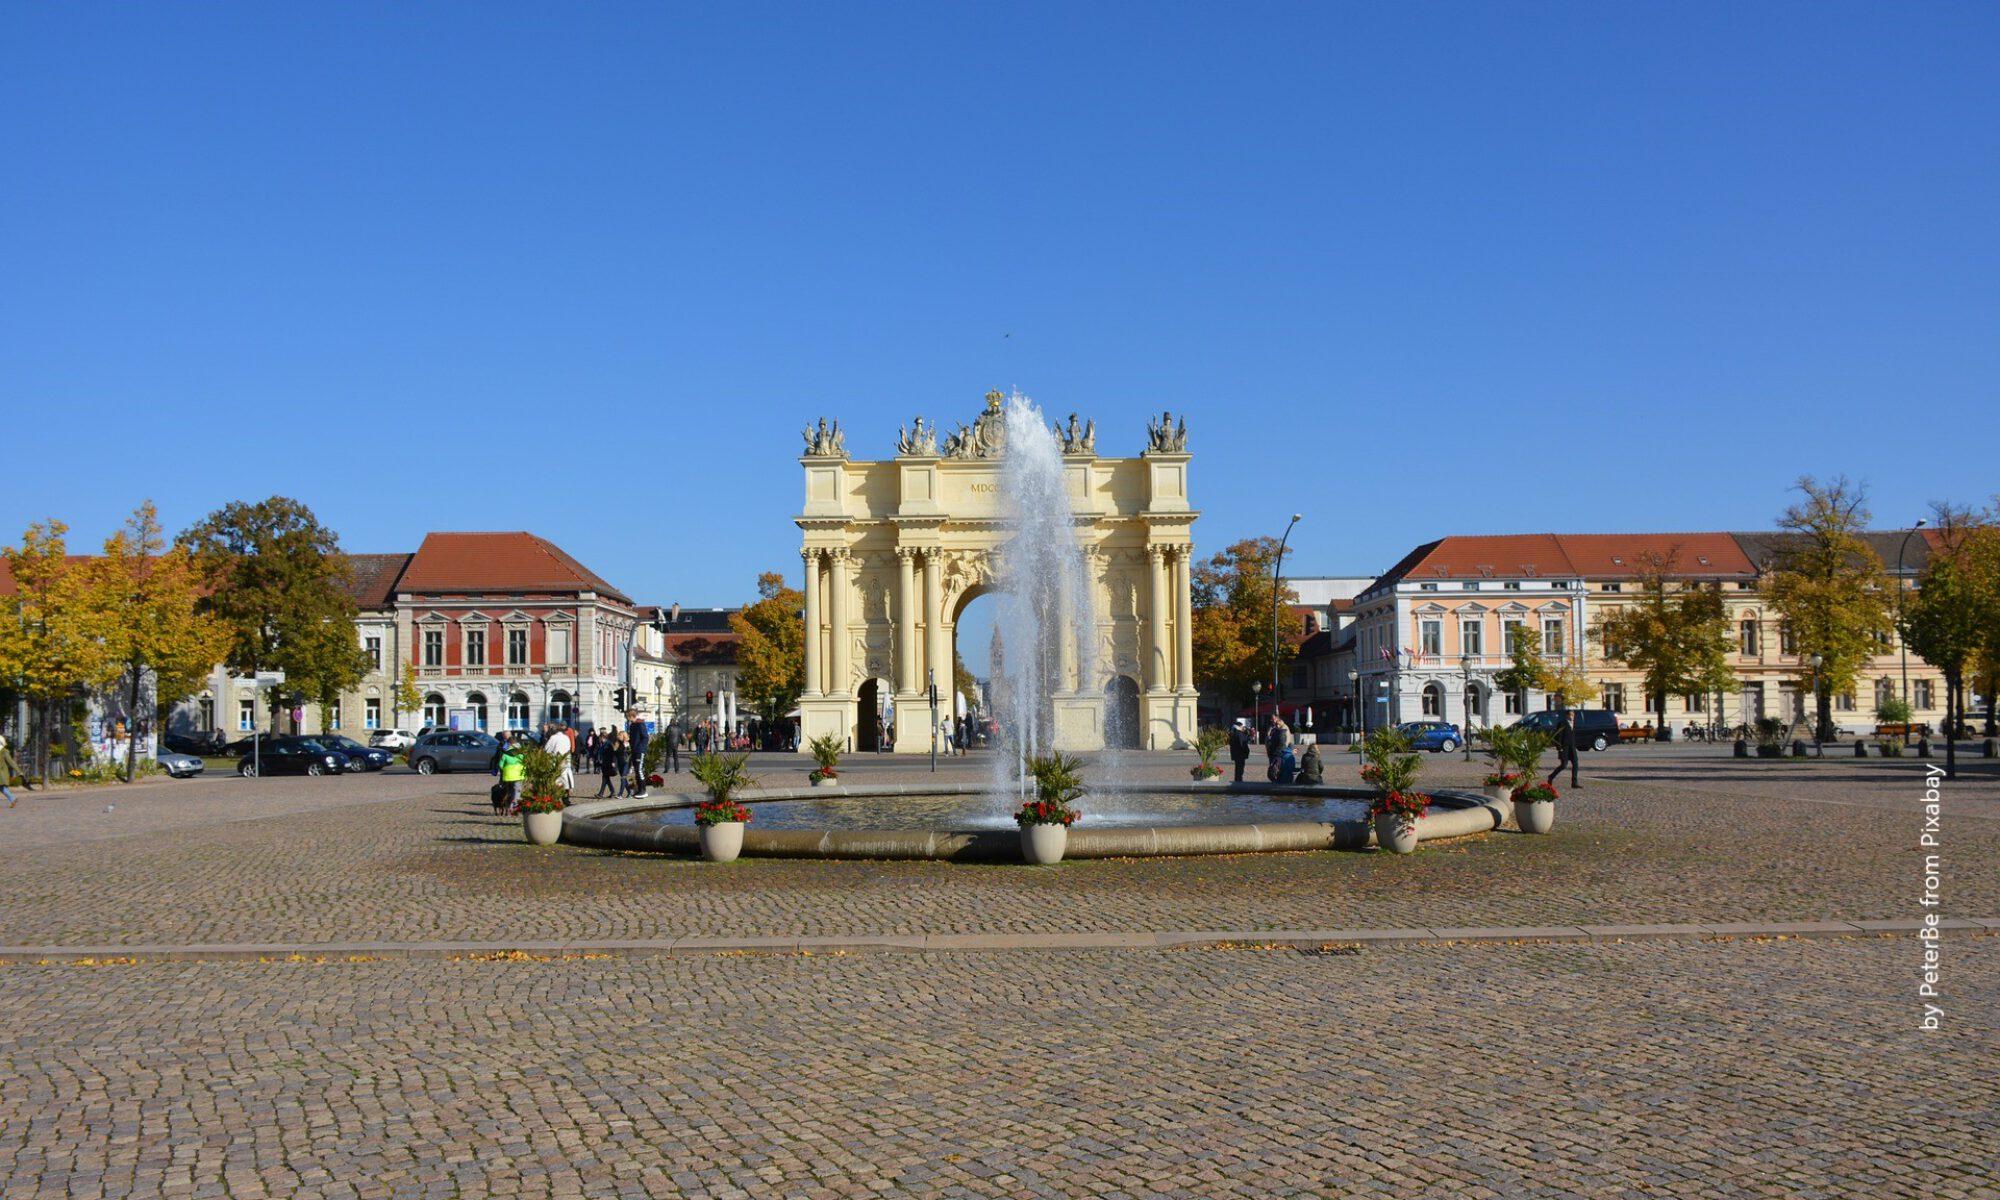 Nehemia Gemeinde Potsdam